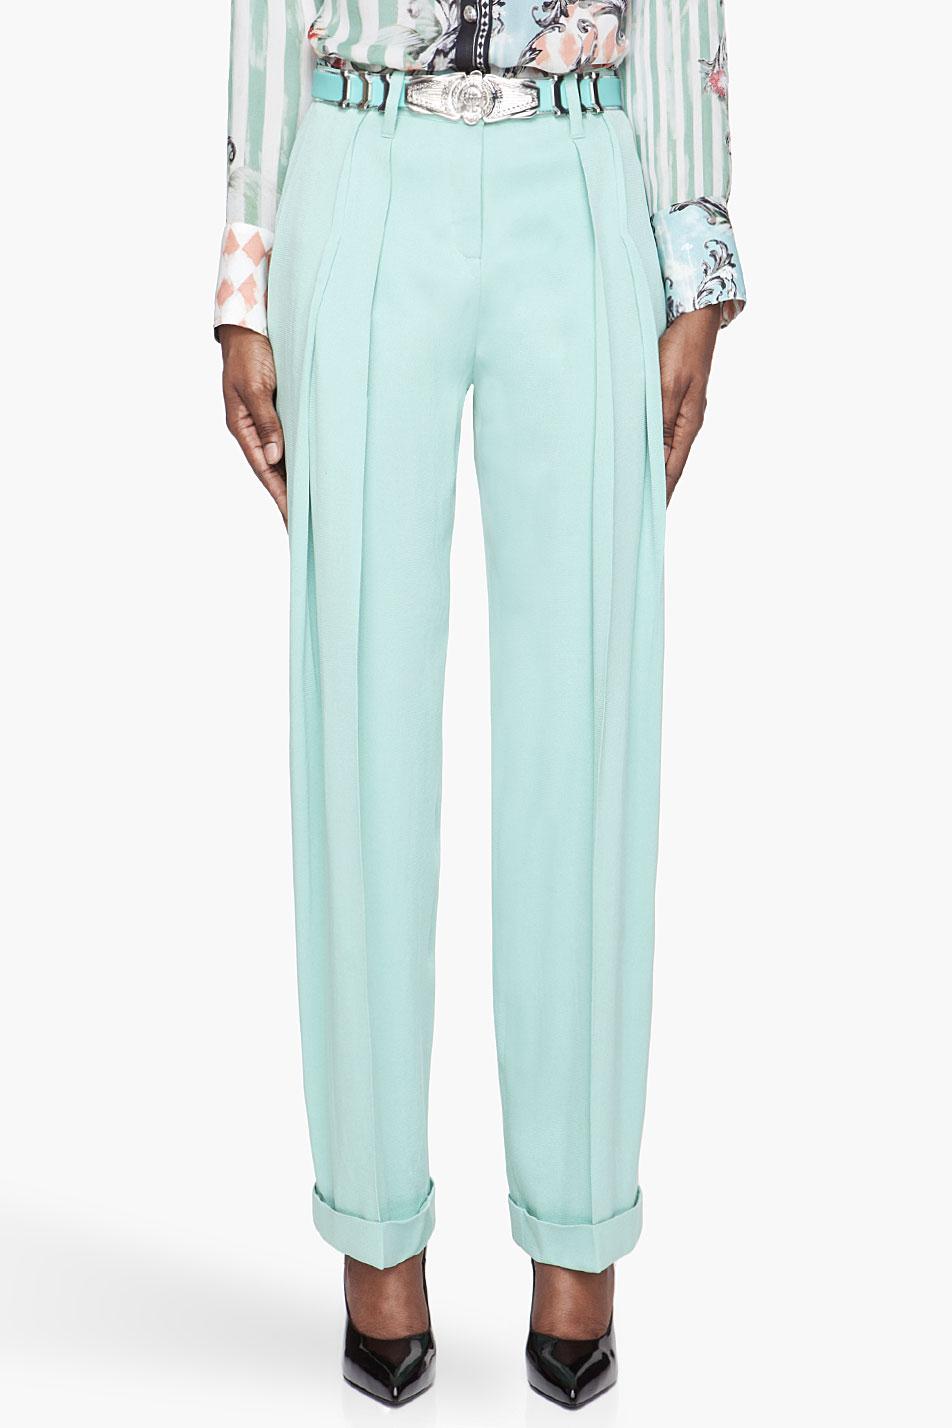 balmain mint green pleated silk trousers